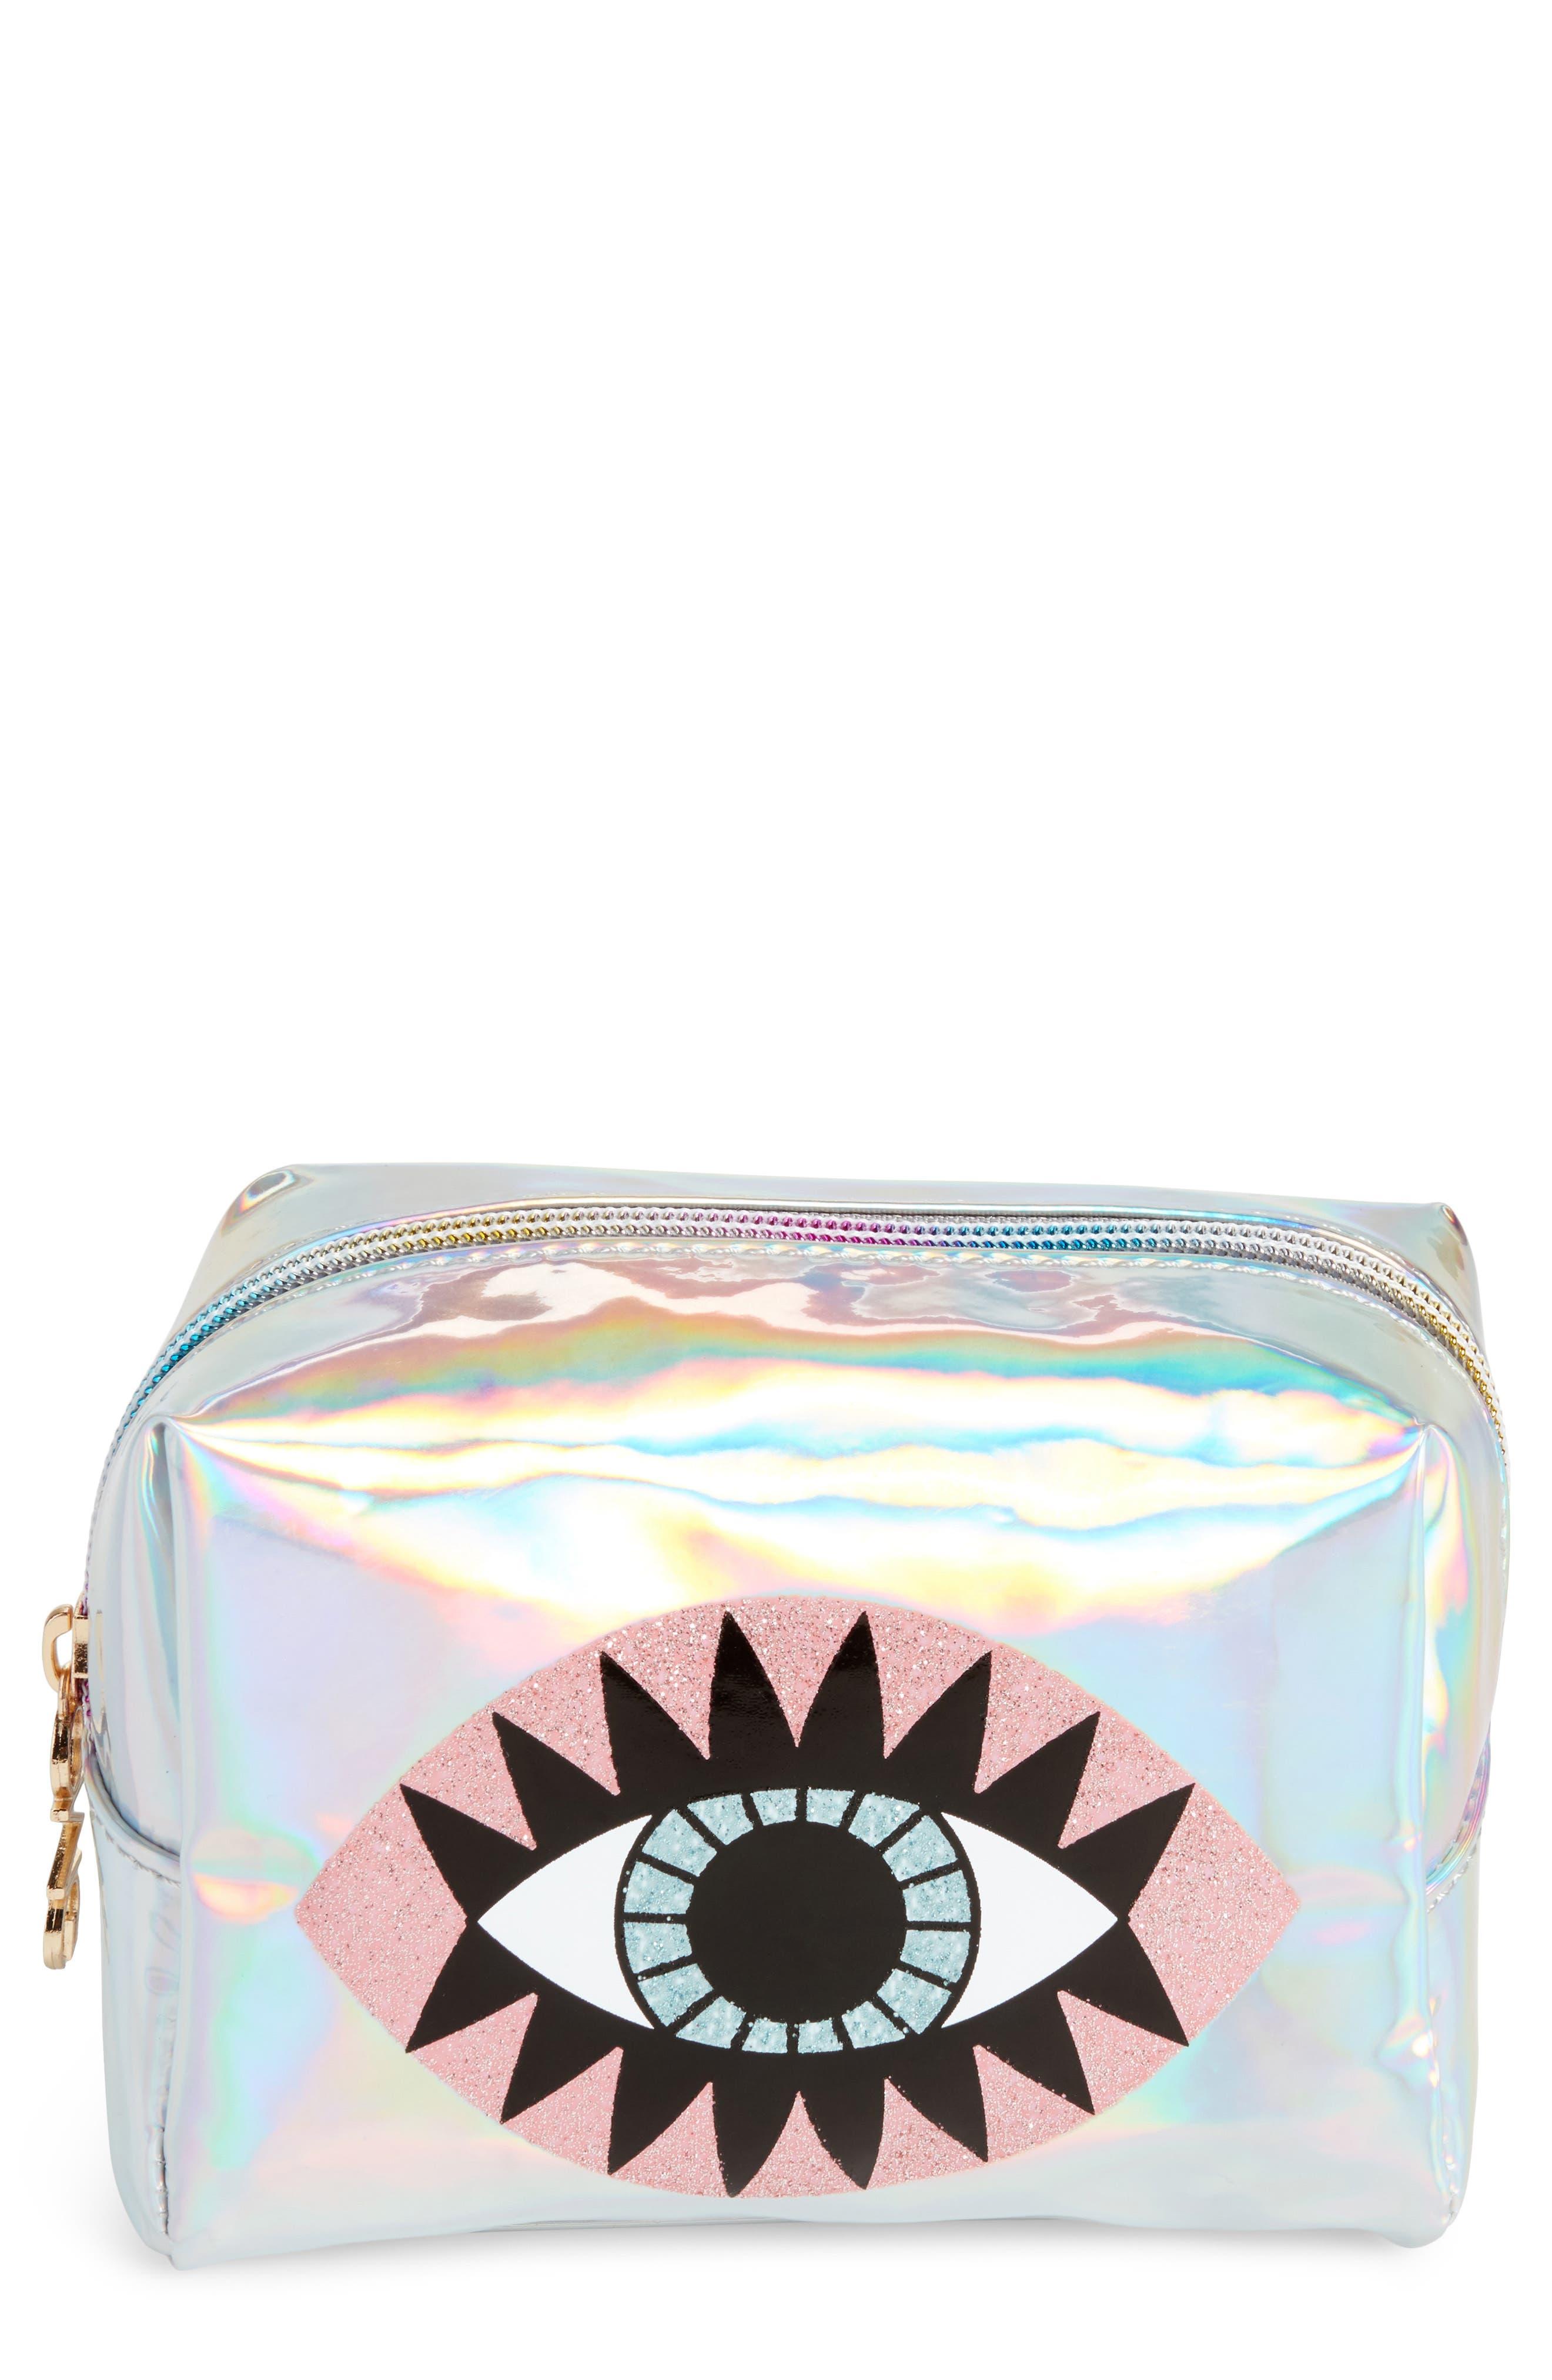 Glitter Eye Iridescent Cosmetics Bag,                             Main thumbnail 1, color,                             040